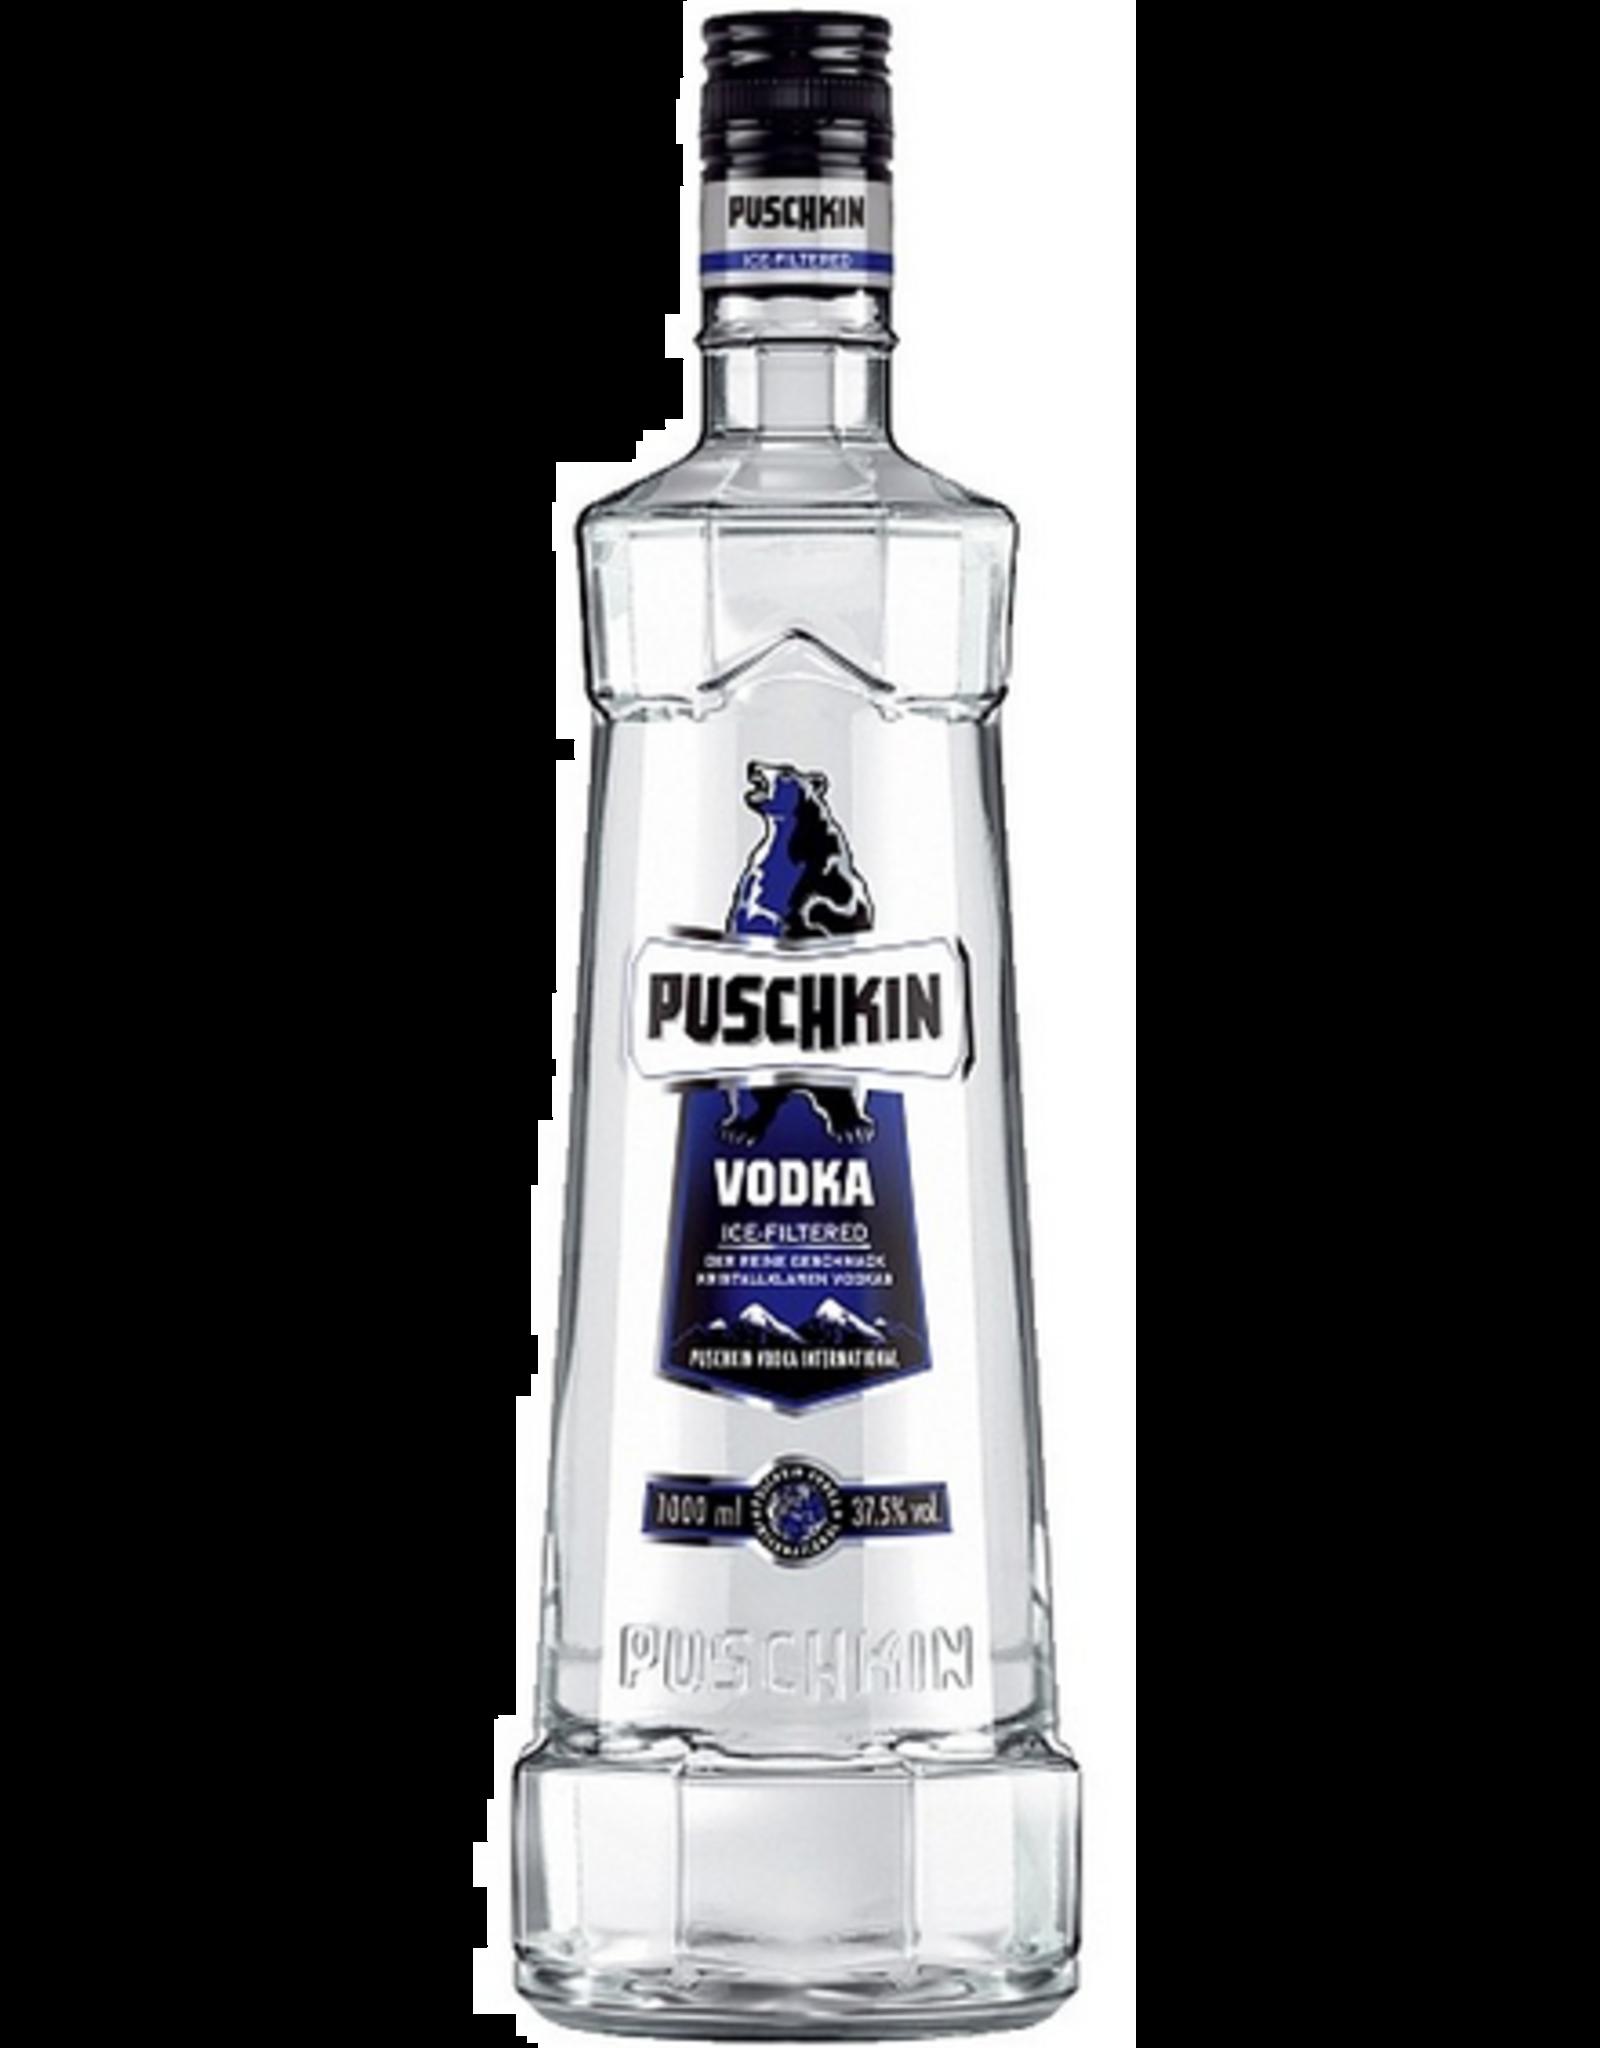 Puschkin Puschkin Vodka 100cl